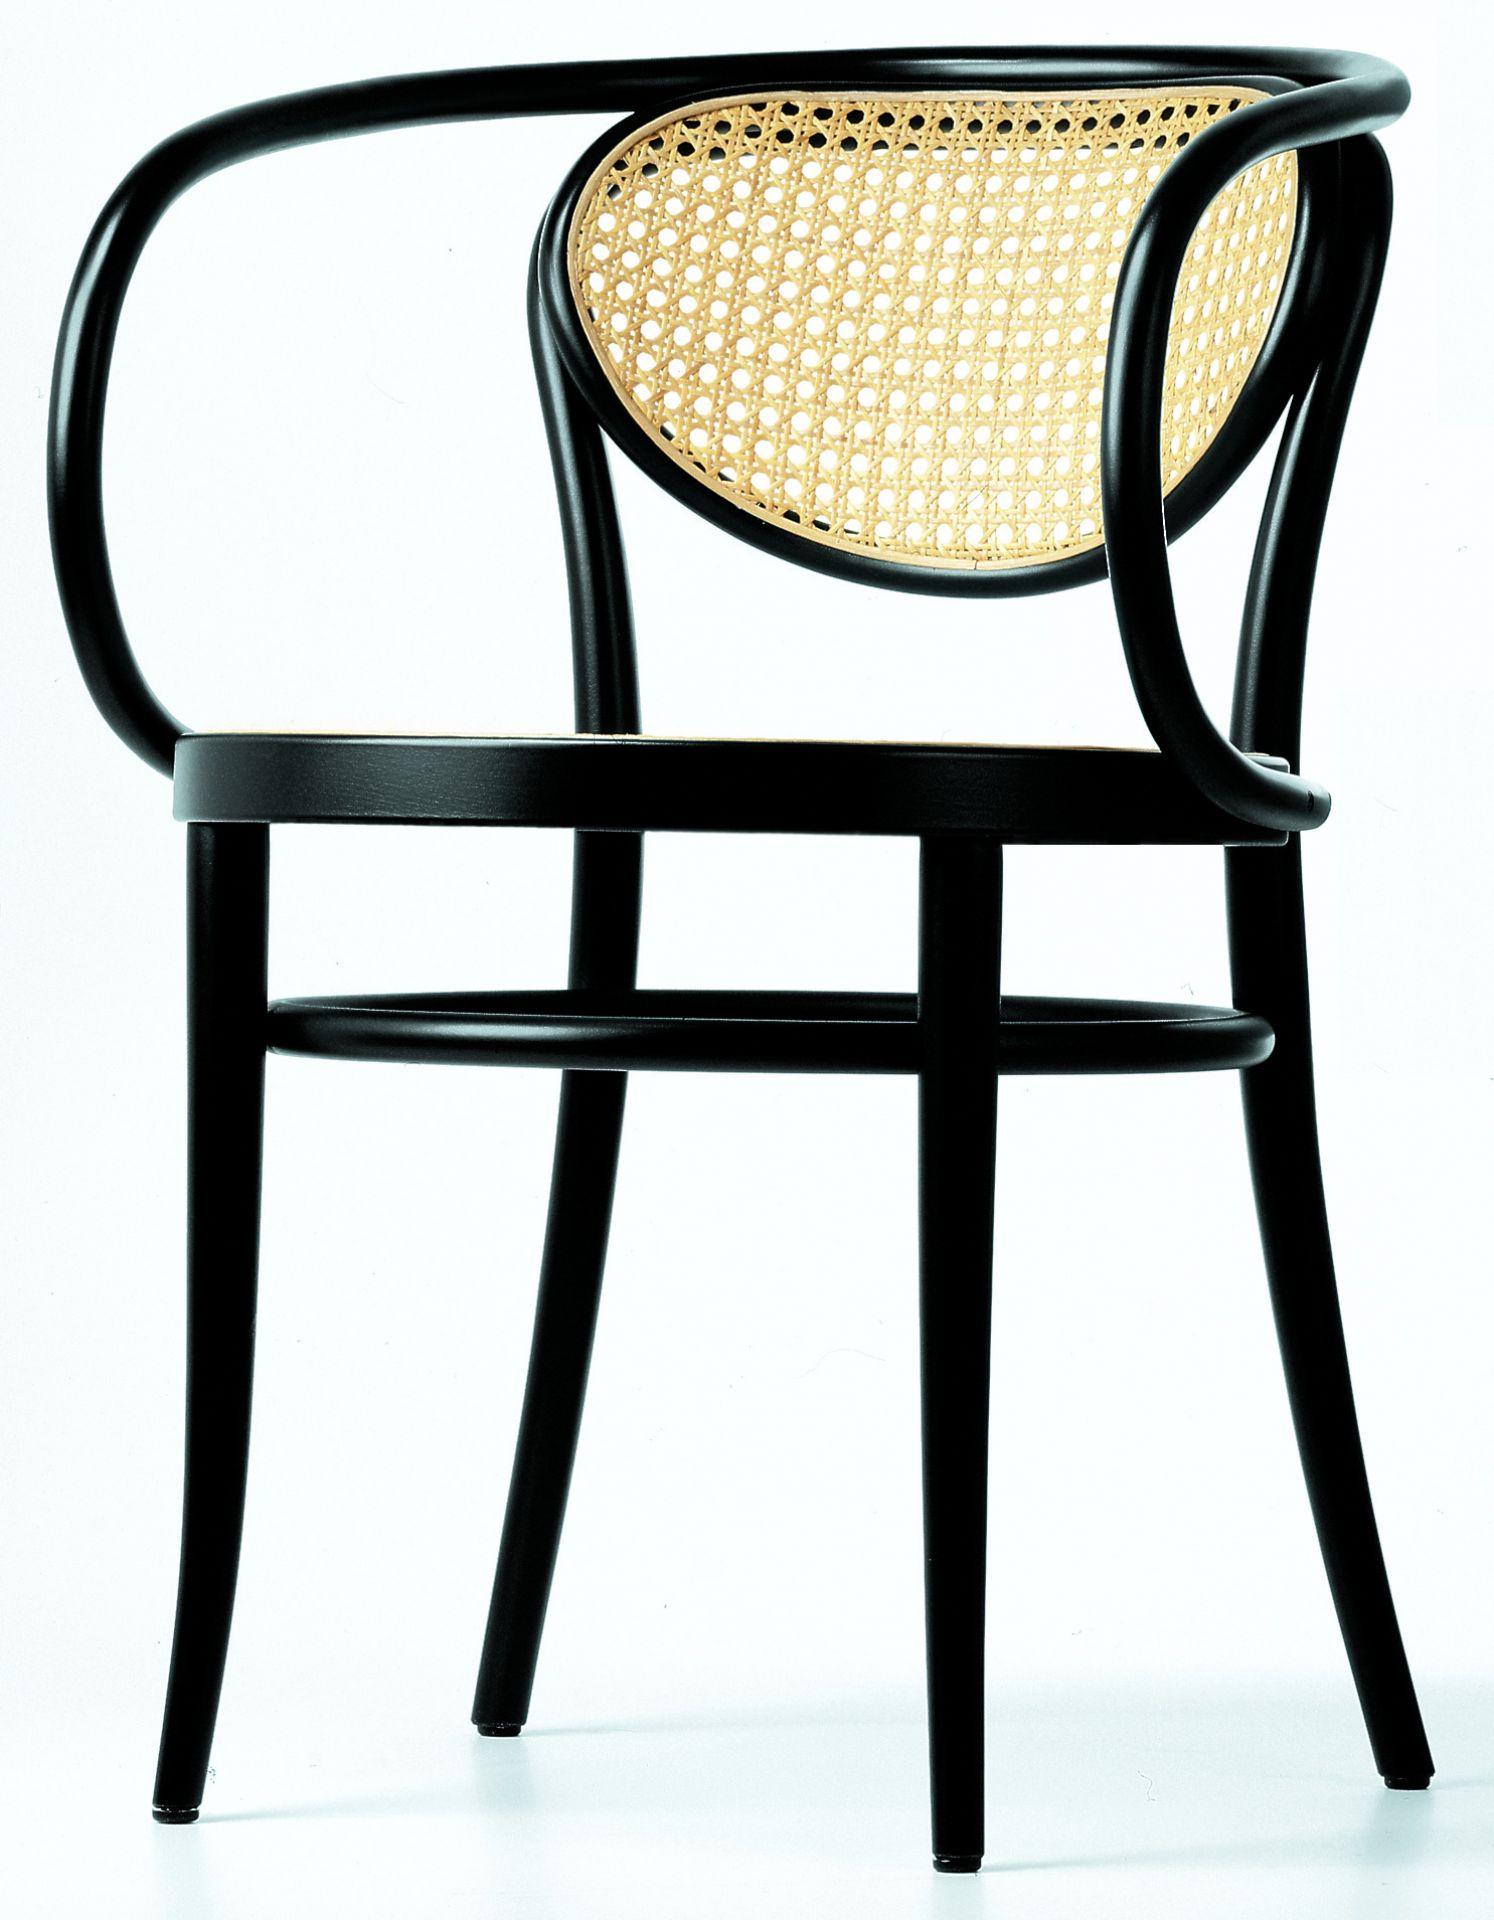 210 R / 210R Bentwood Chair Thonet